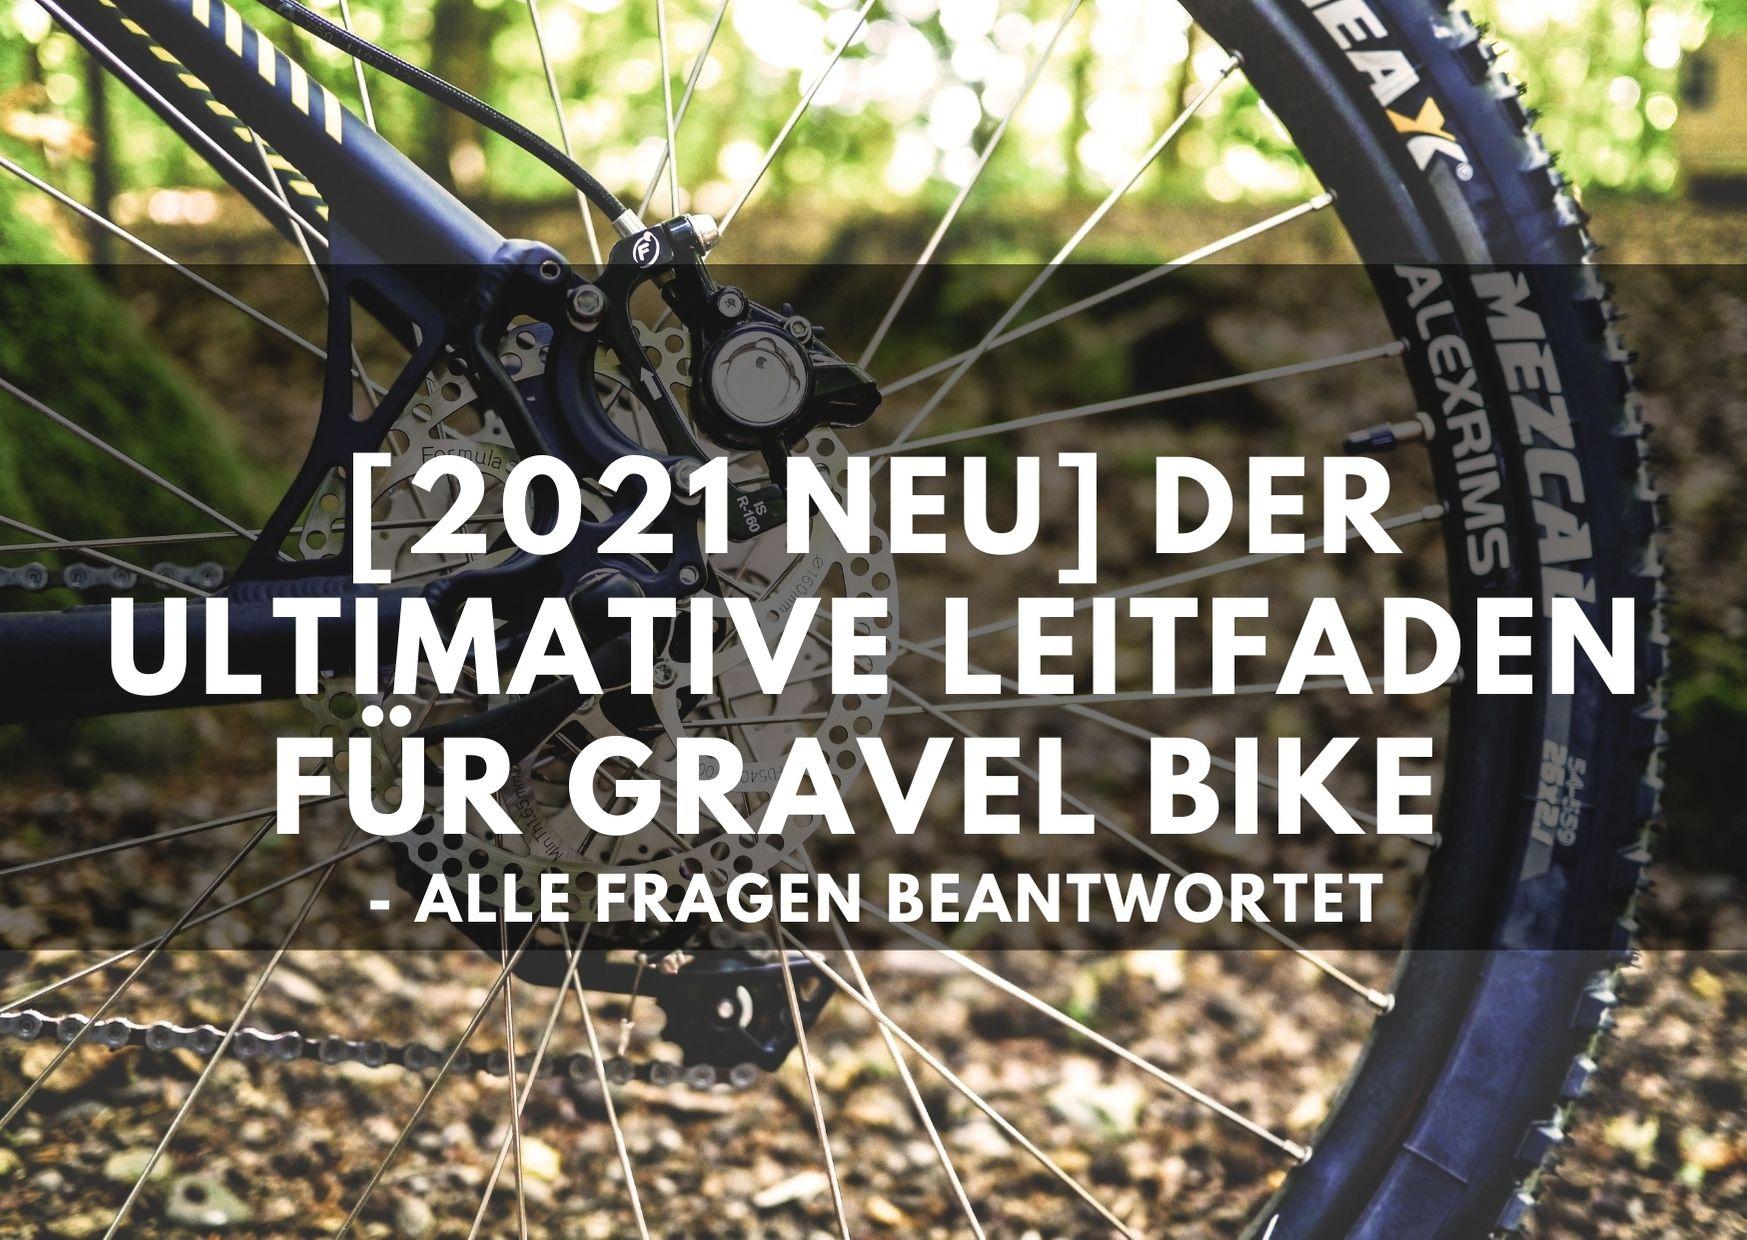 ultimative-leitfaden-fur-gravel-bike